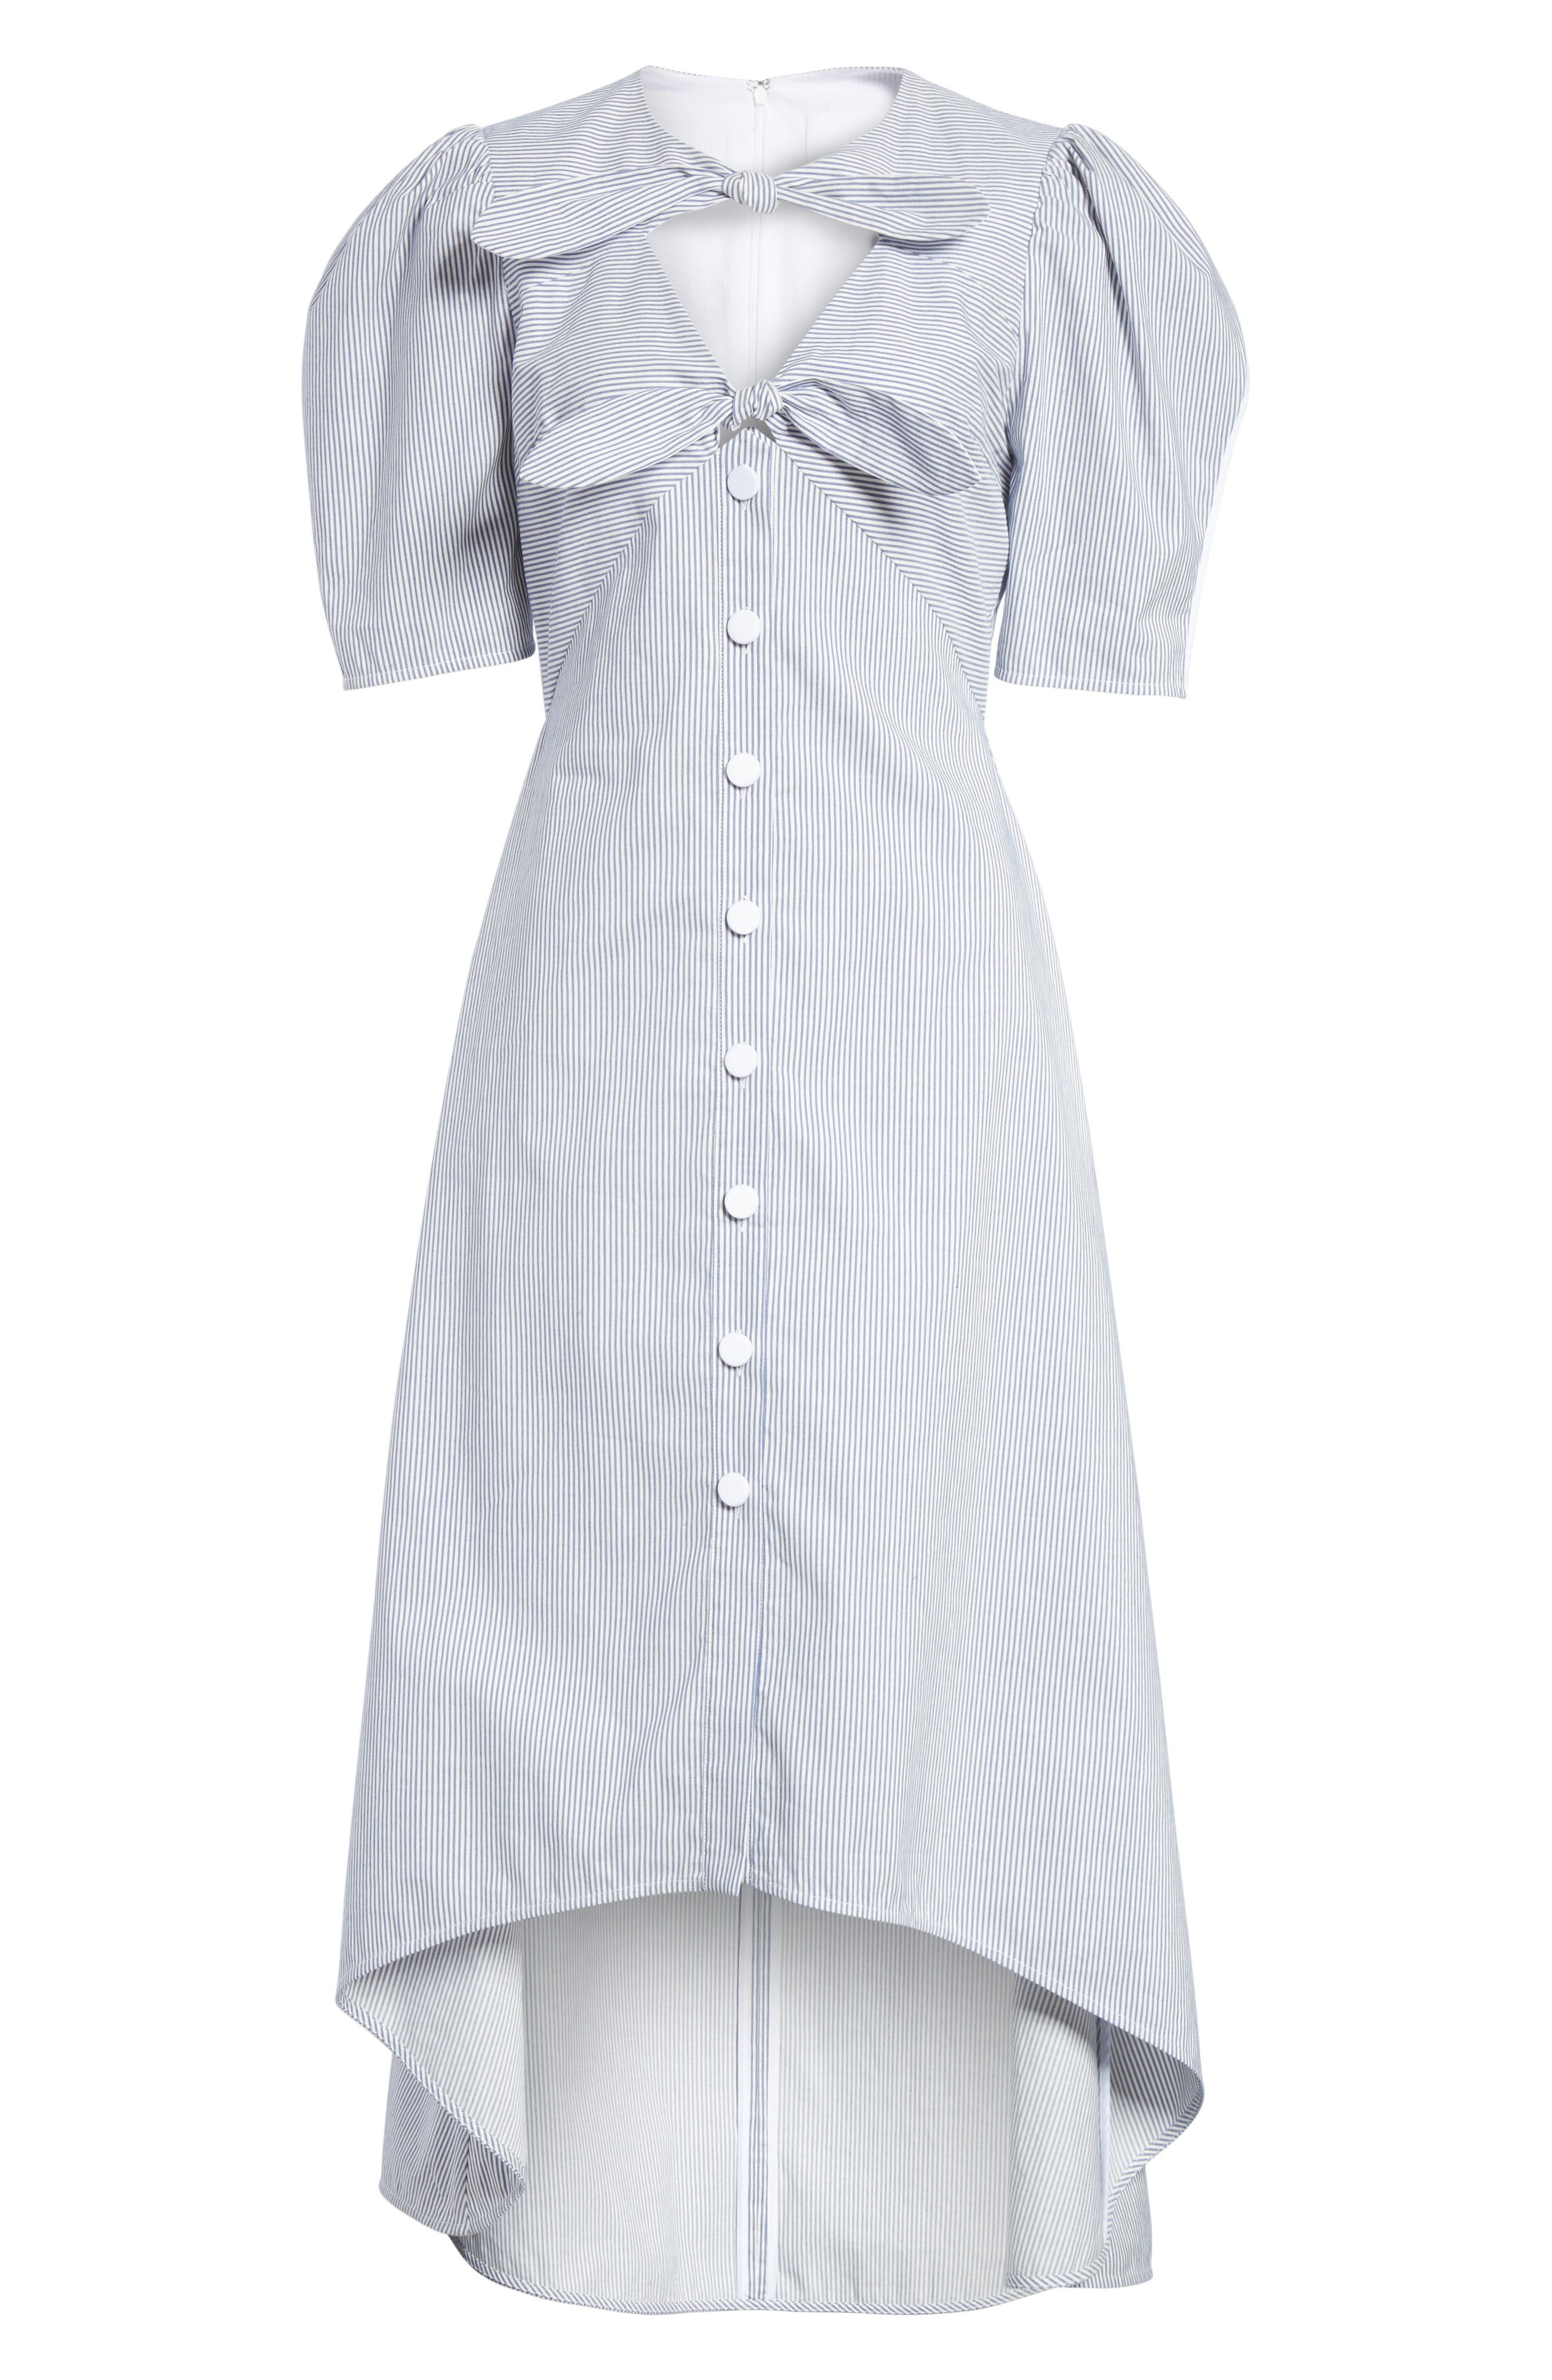 Prose & Poetry Camila Double Front Tie Midi Dress,                             Alternate thumbnail 6, color,                             Canvas Stripe